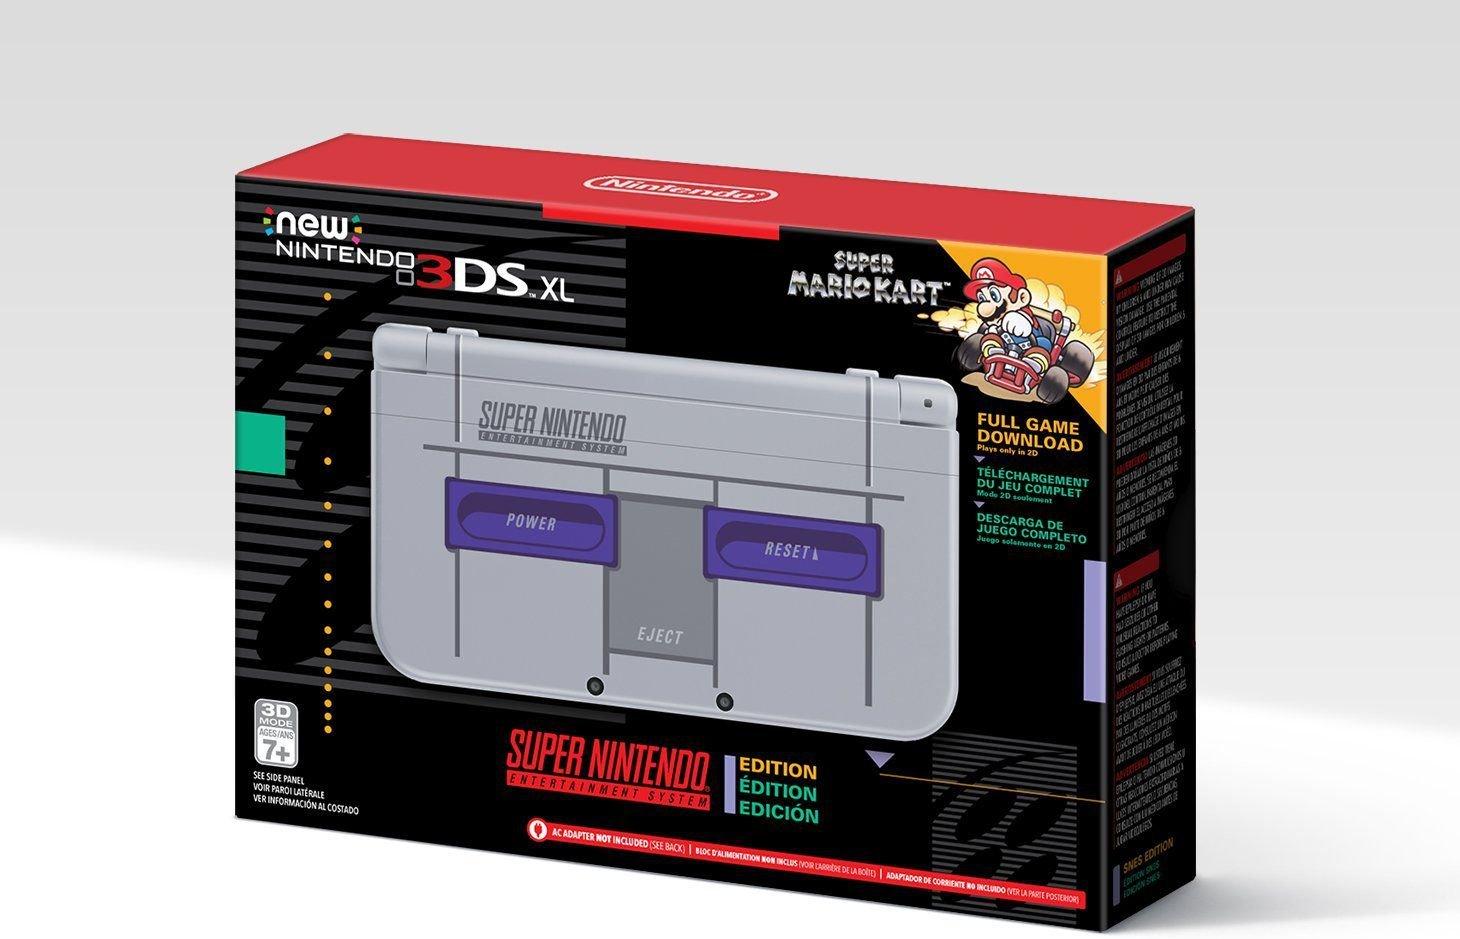 Super Nintendo Themed New 3Ds Xl Hitting North America November 27 1